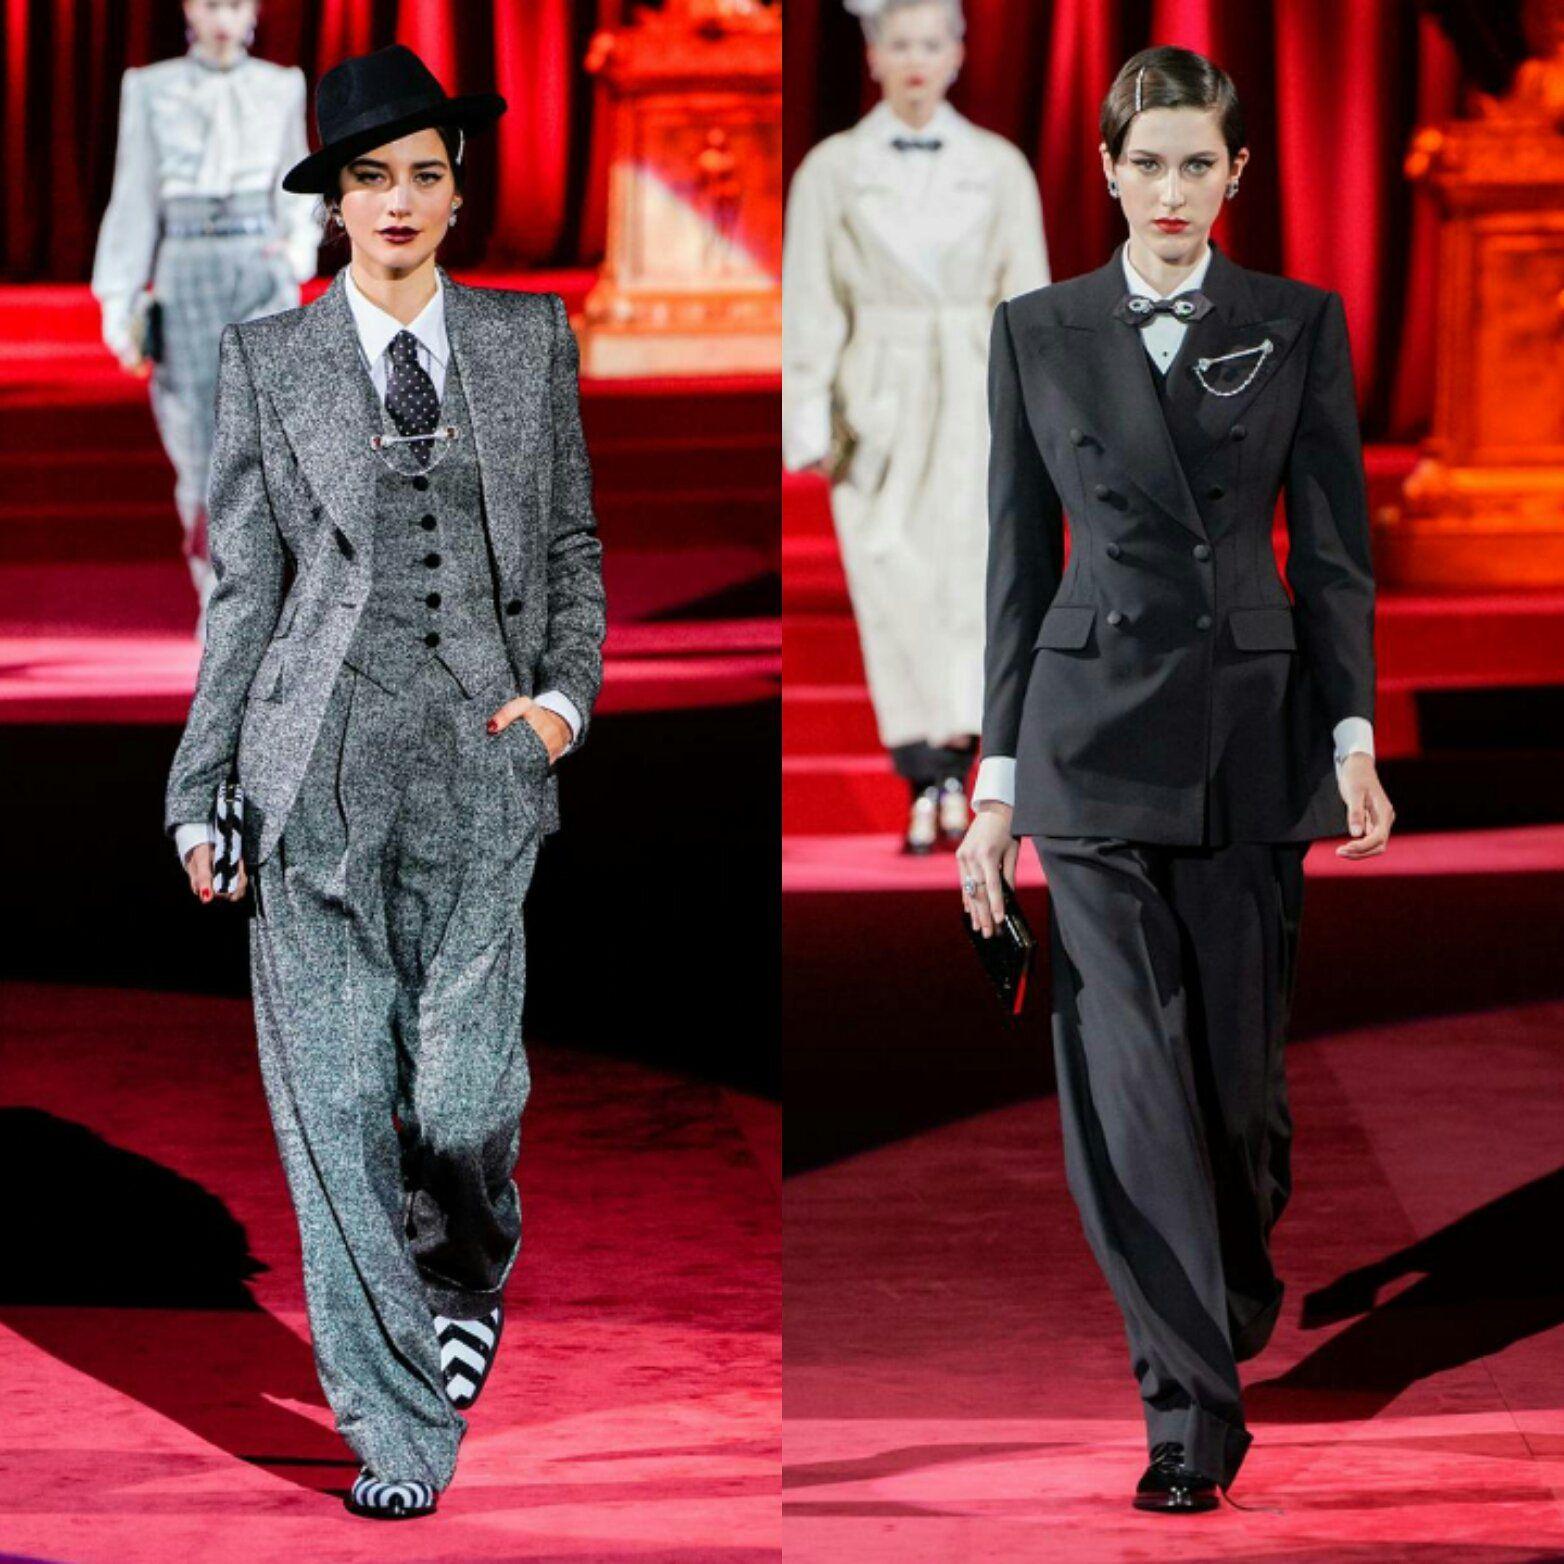 miow on twitter fashion fashion images stylish